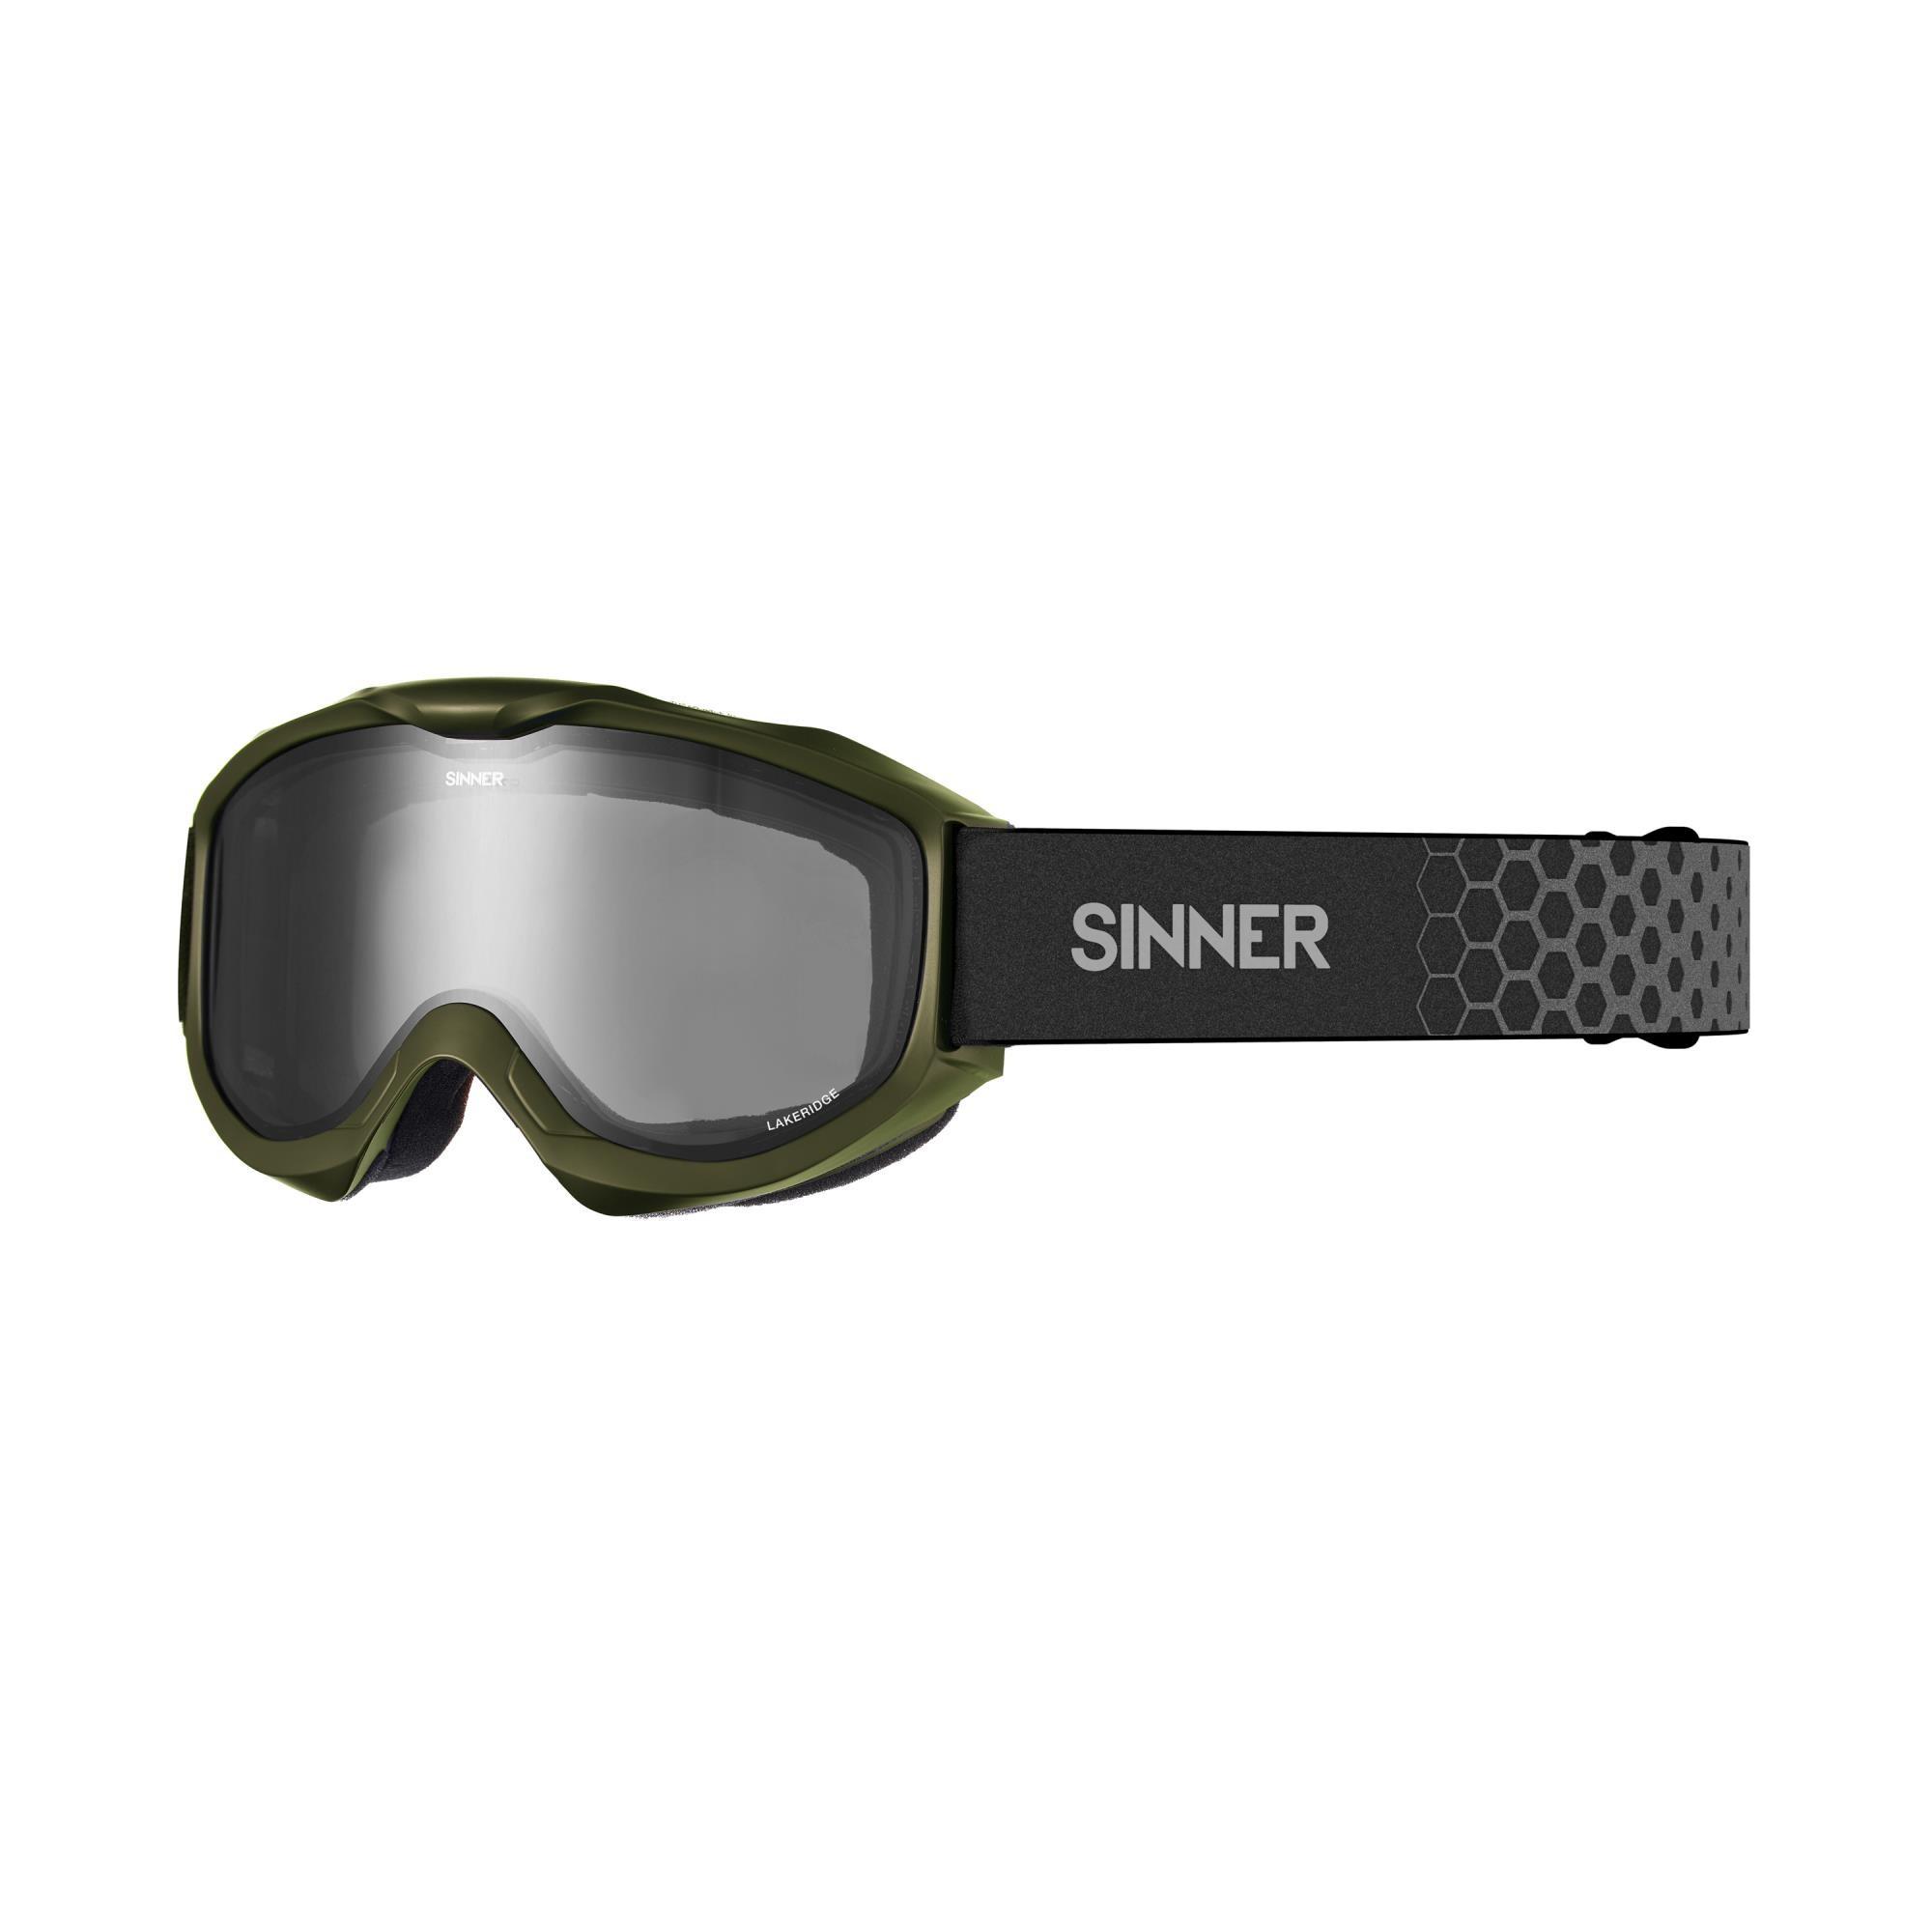 Sinner Lakeridge Skibril - Mat Mosgroen - Smoke Lens